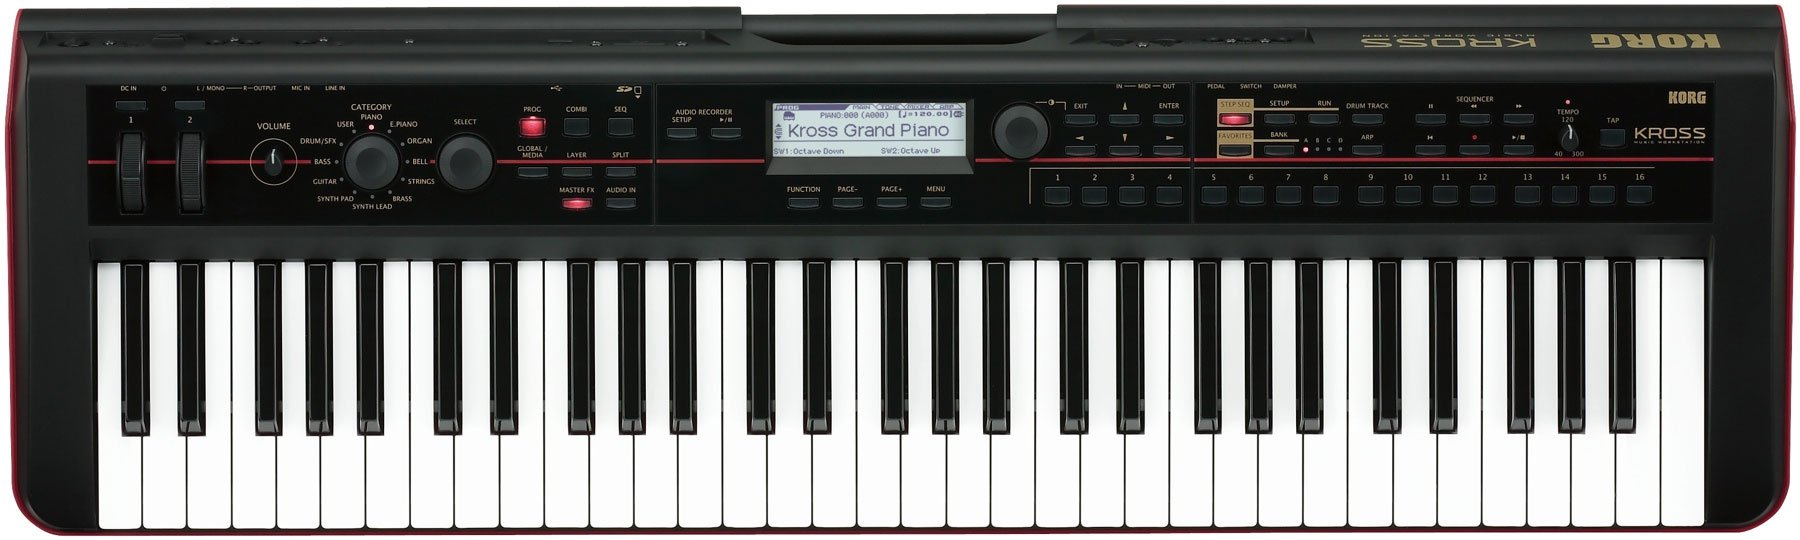 61-Key Workstation Keyboard/Synthesizer